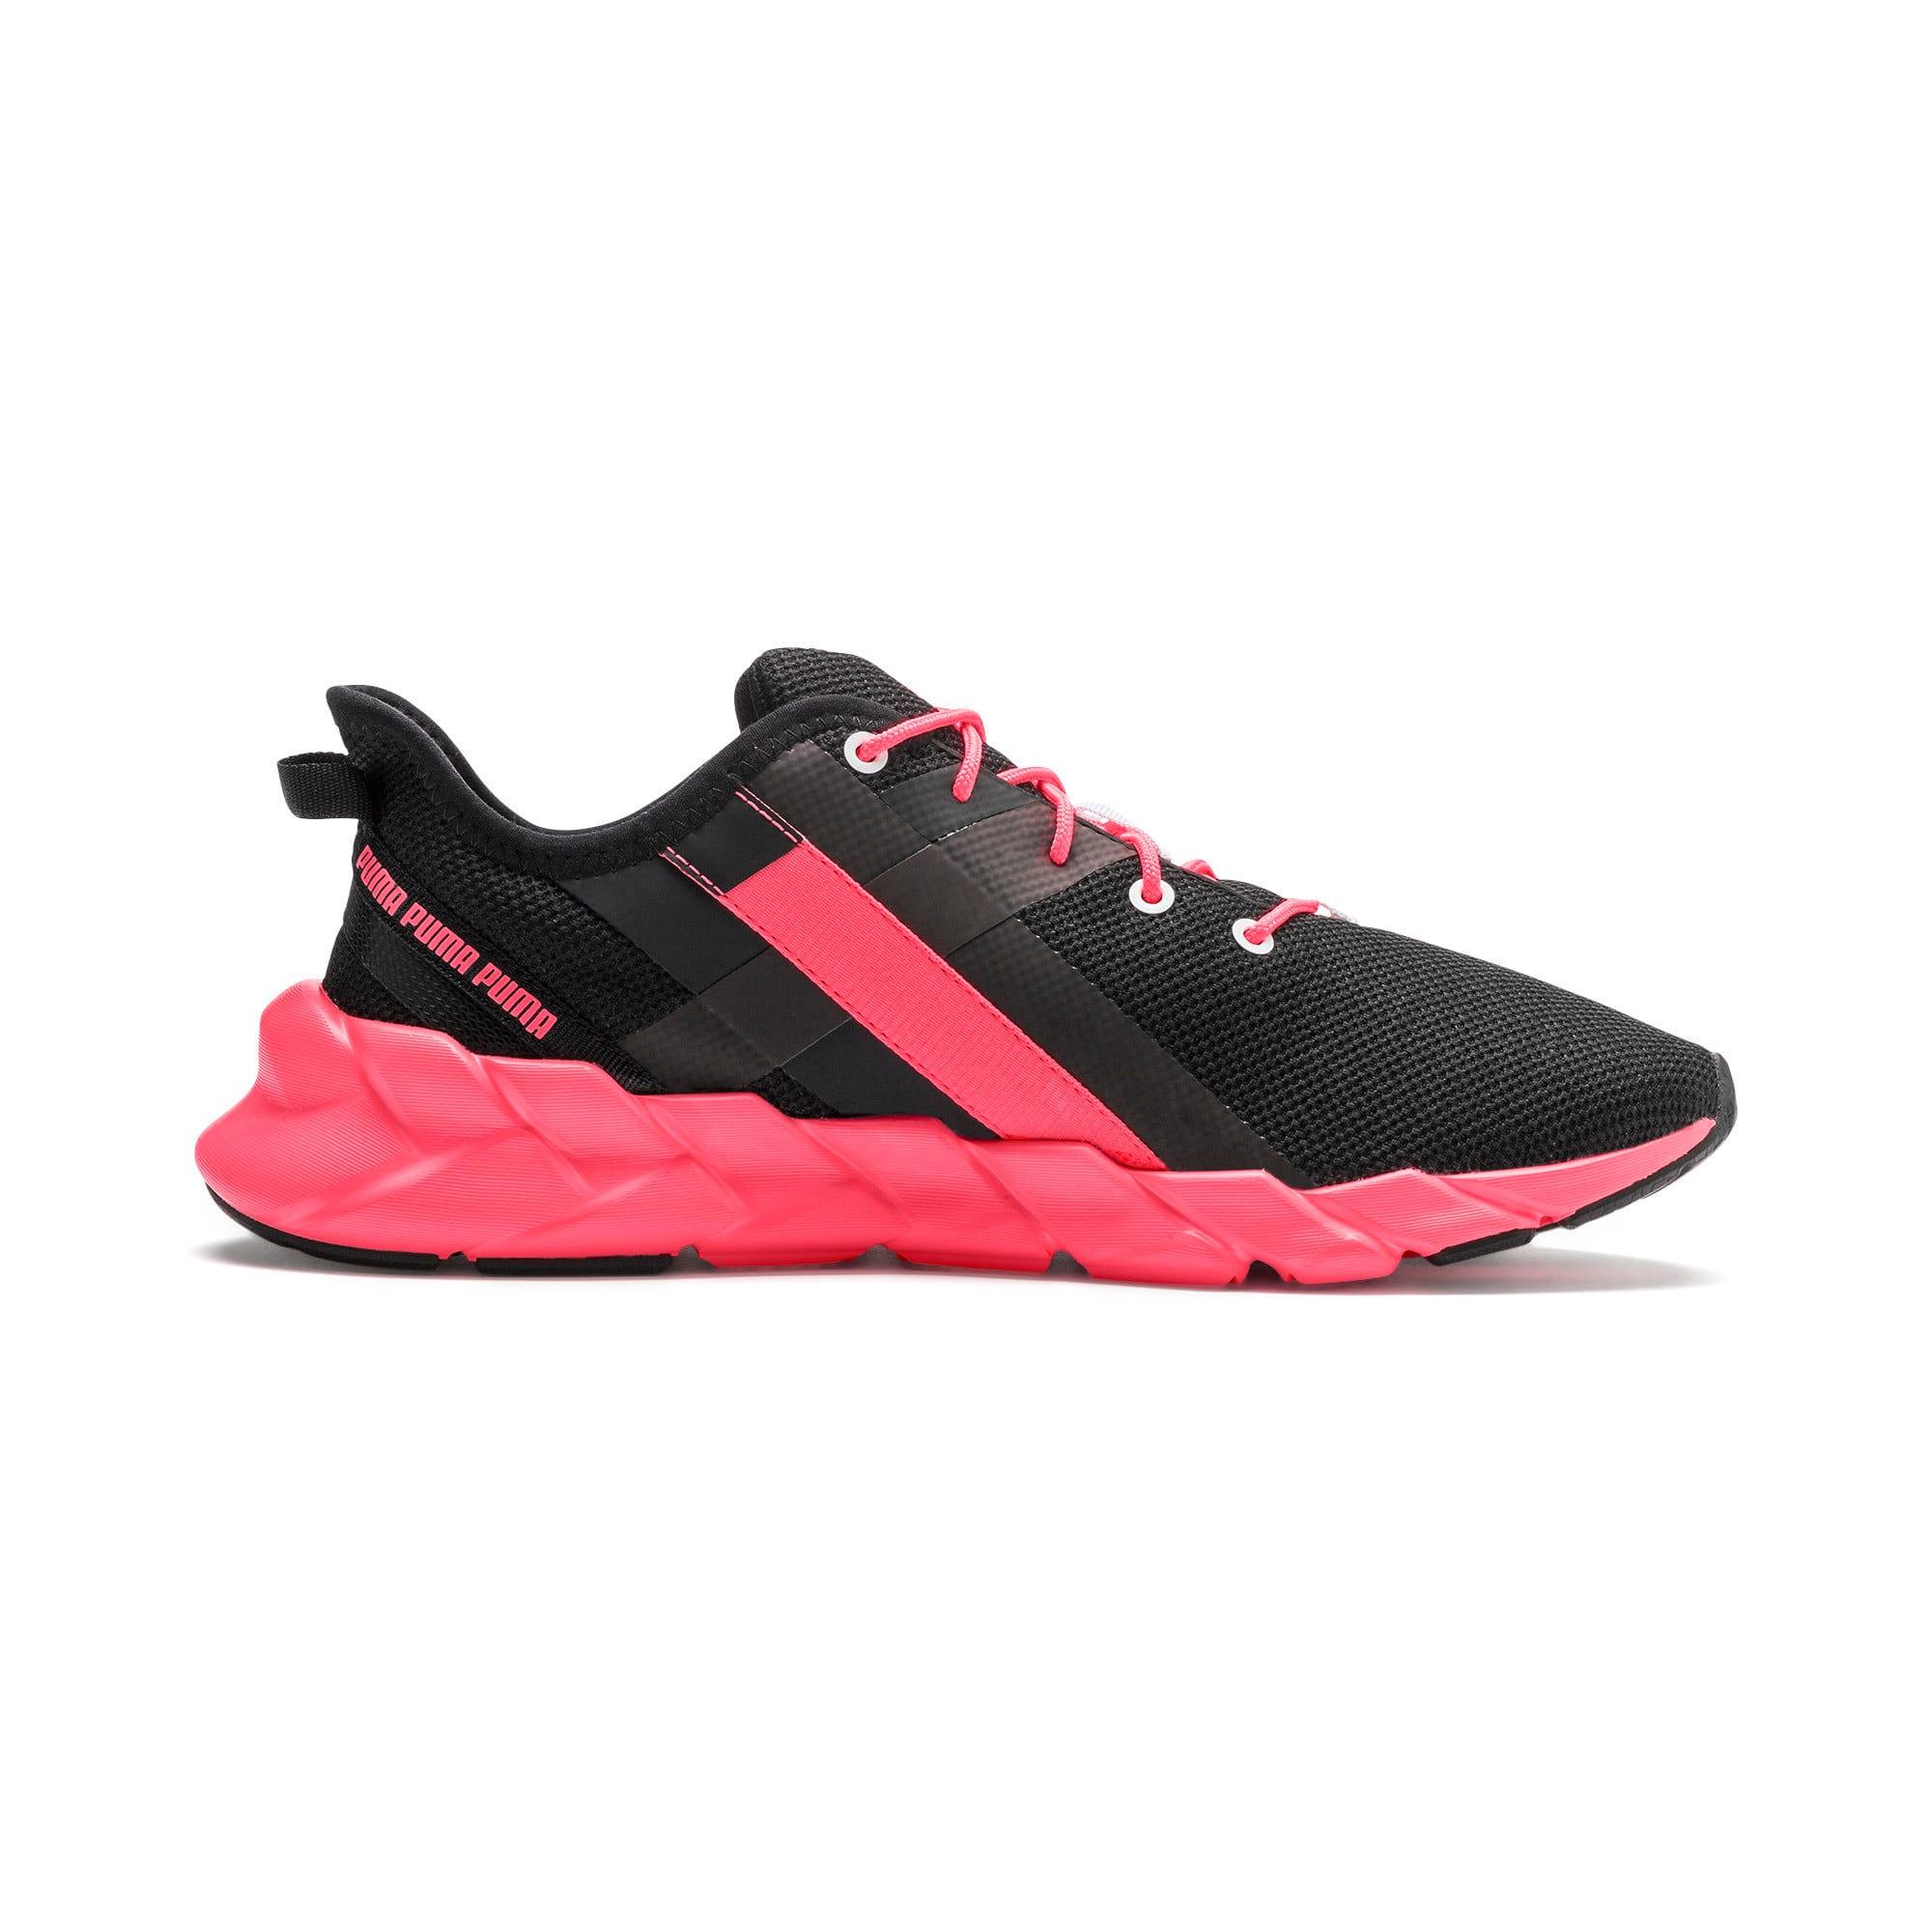 Thumbnail 9 of Weave XT Women's Training Shoes, Puma Black-Pink Alert, medium